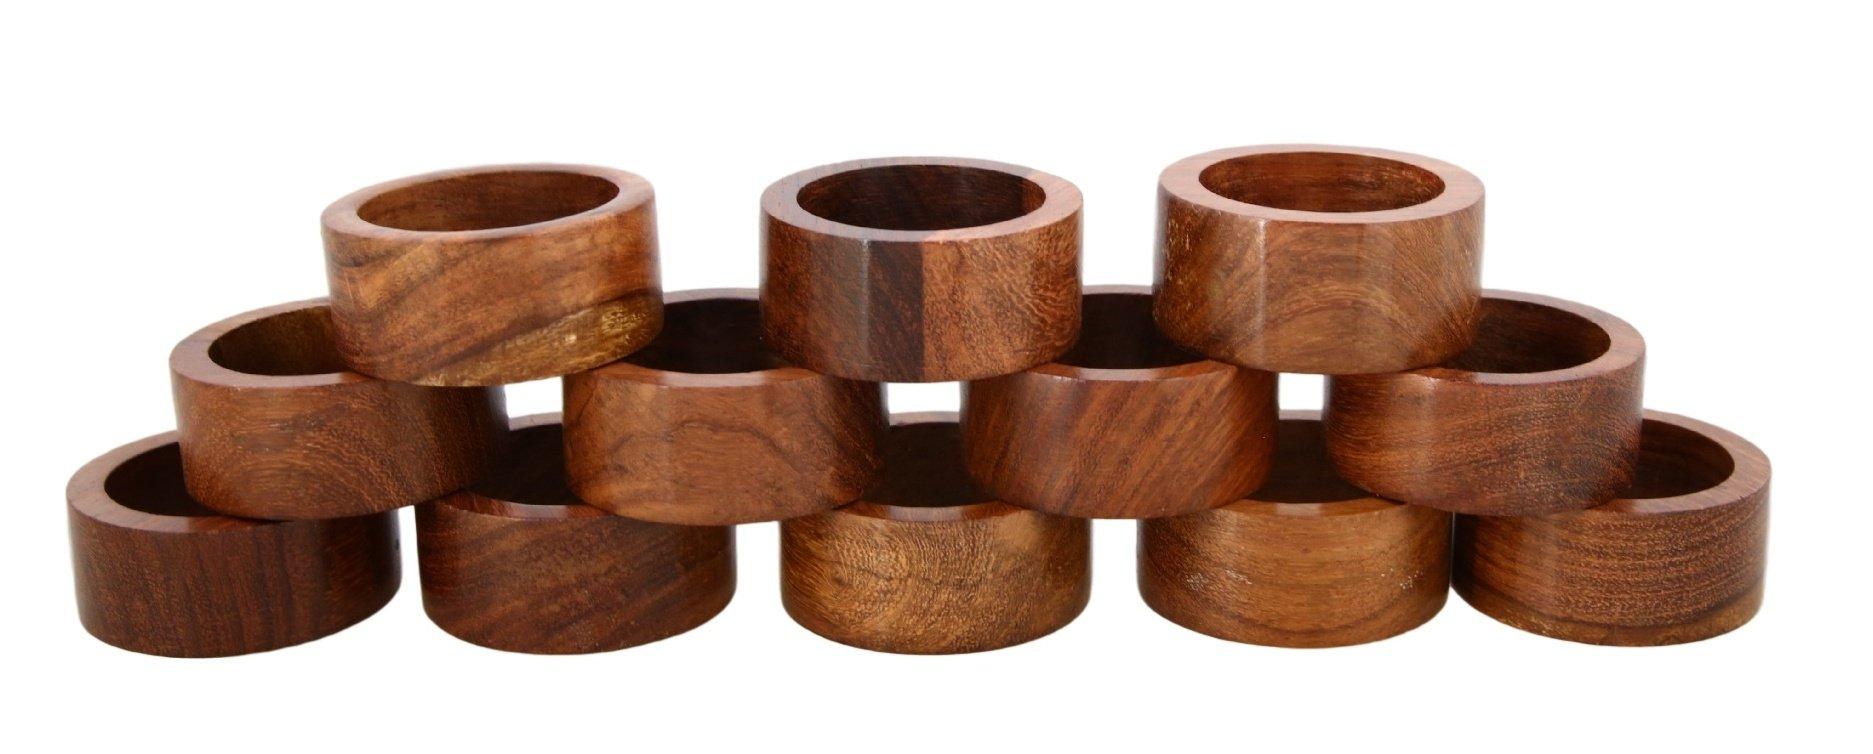 Shalinindia Handmade Wood Napkin Ring Set With 12 Napkin Rings - Artisan Crafted in India